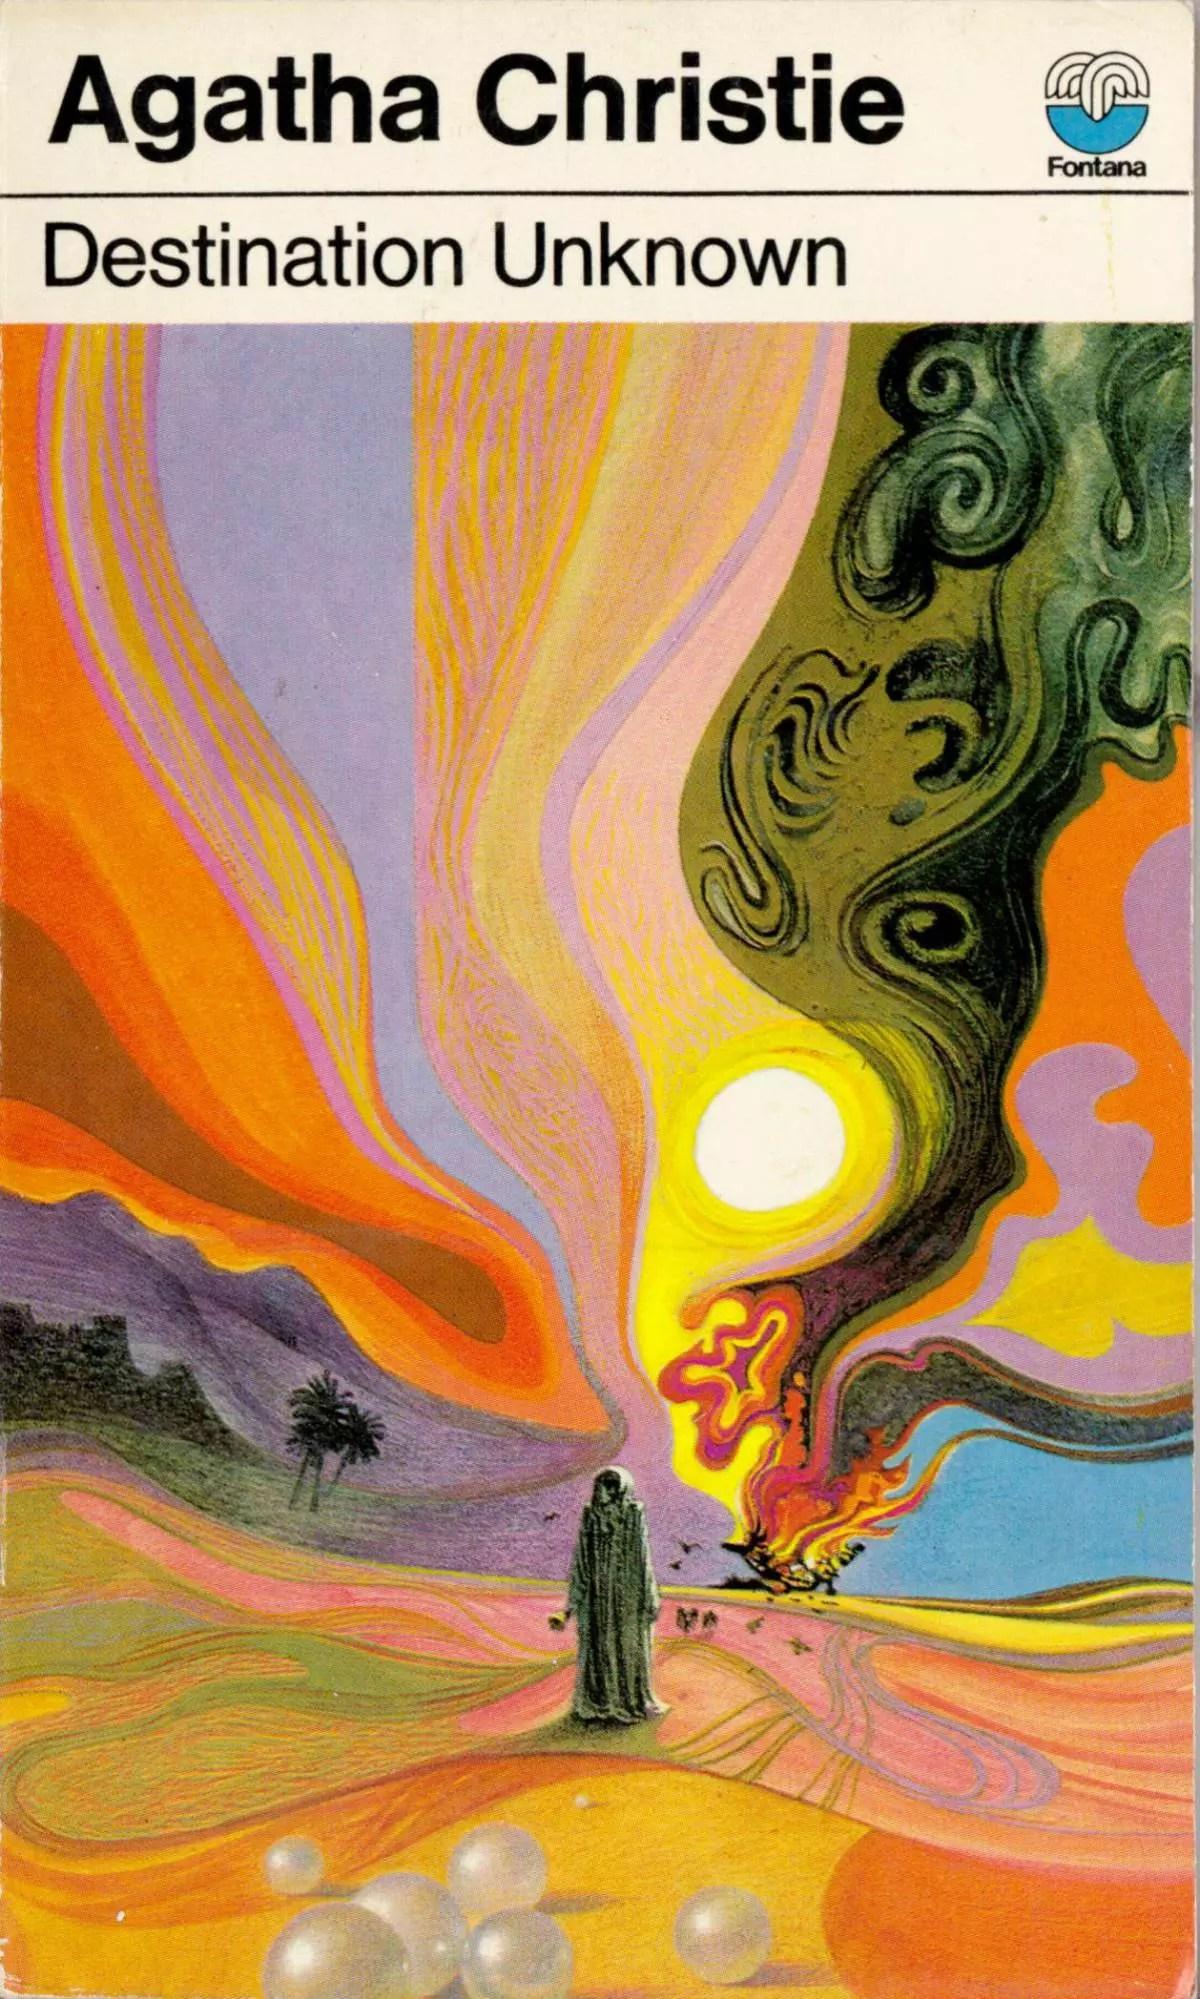 Agatha Christie Tom Adams Destination Unknown Fontana 1973